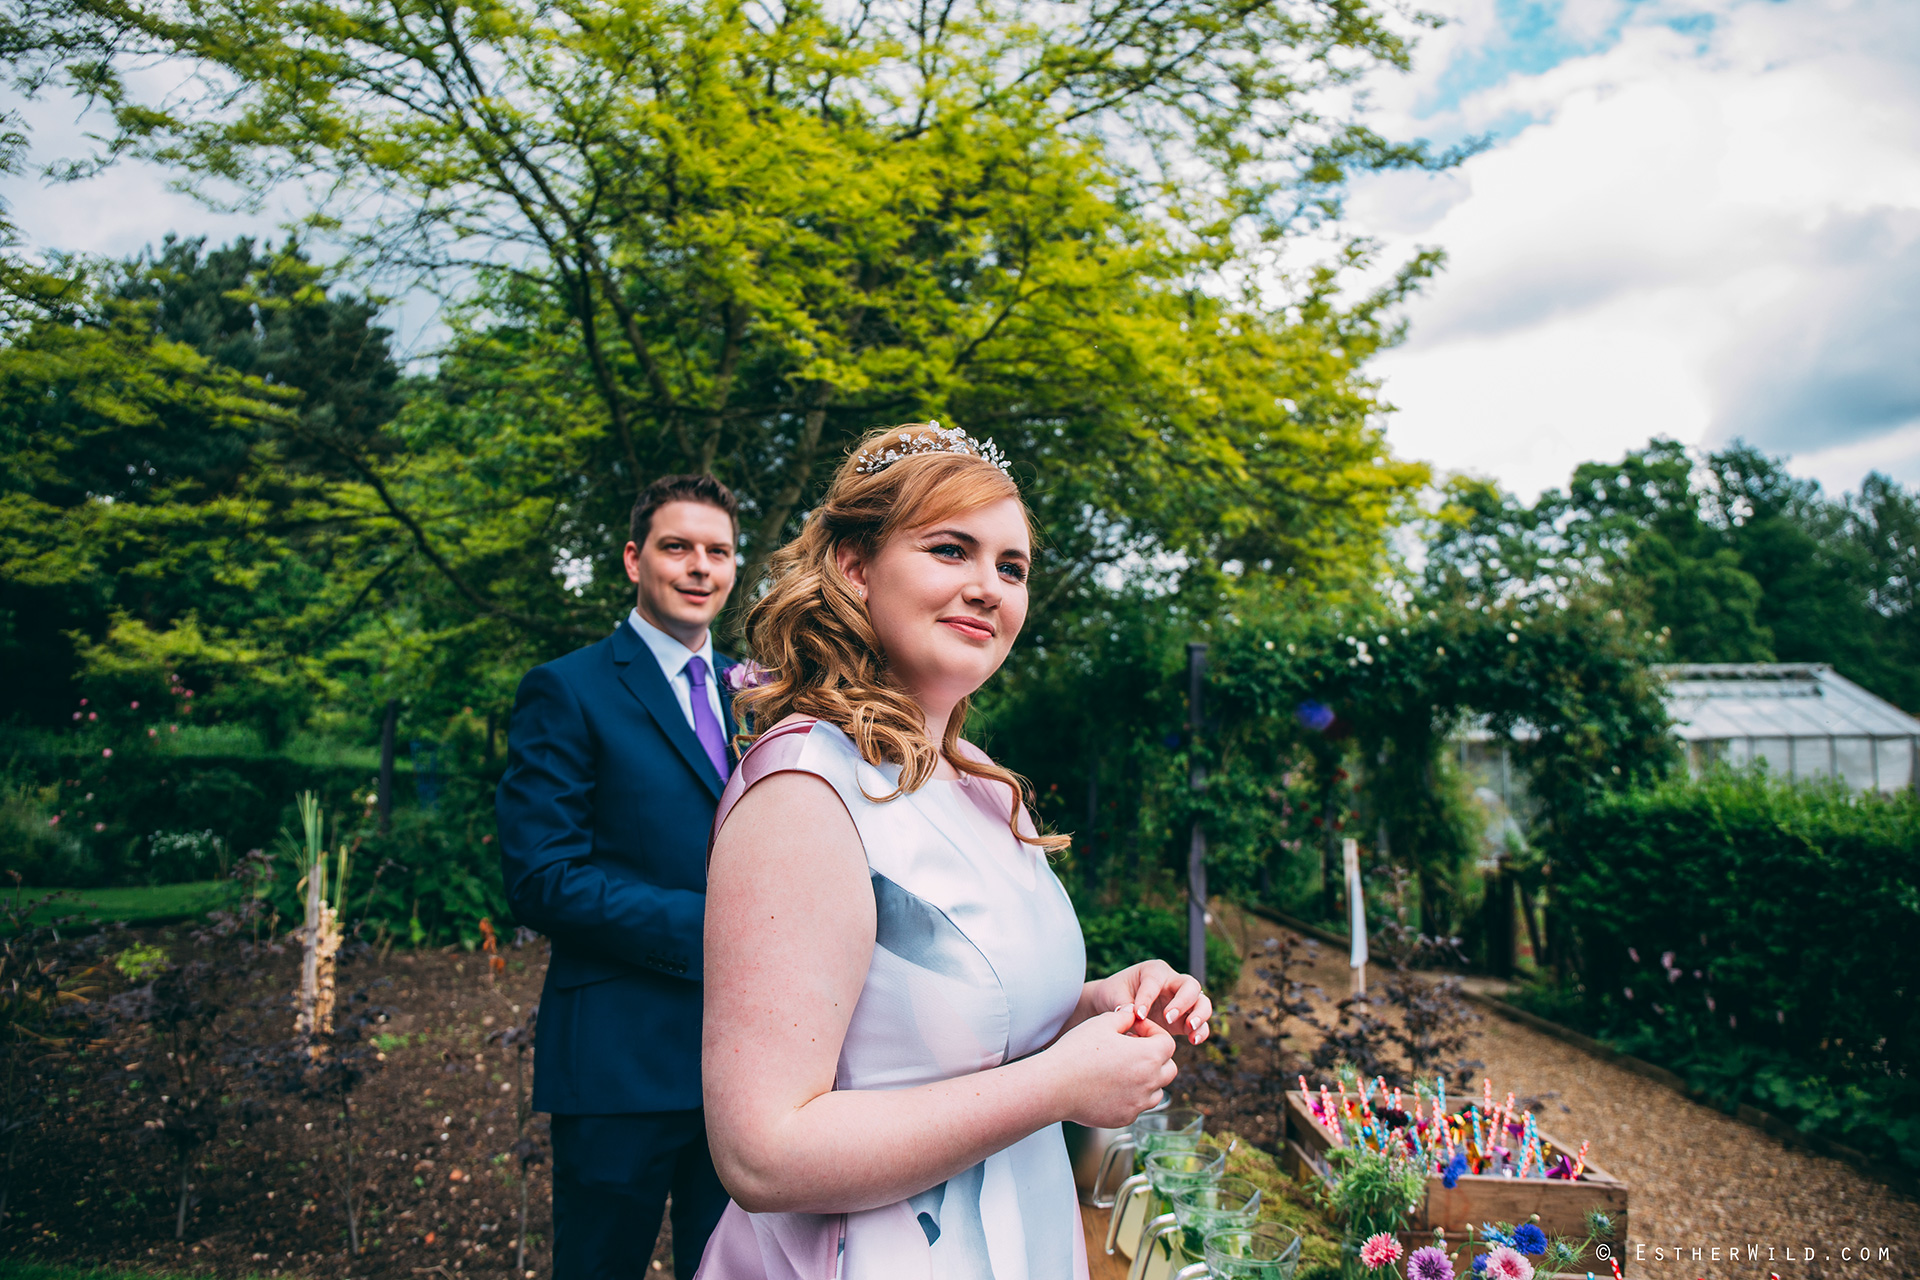 Norfolk_Wedding_Photographer_Mannington_Hall_Country_Esther_Wild_0107.jpg